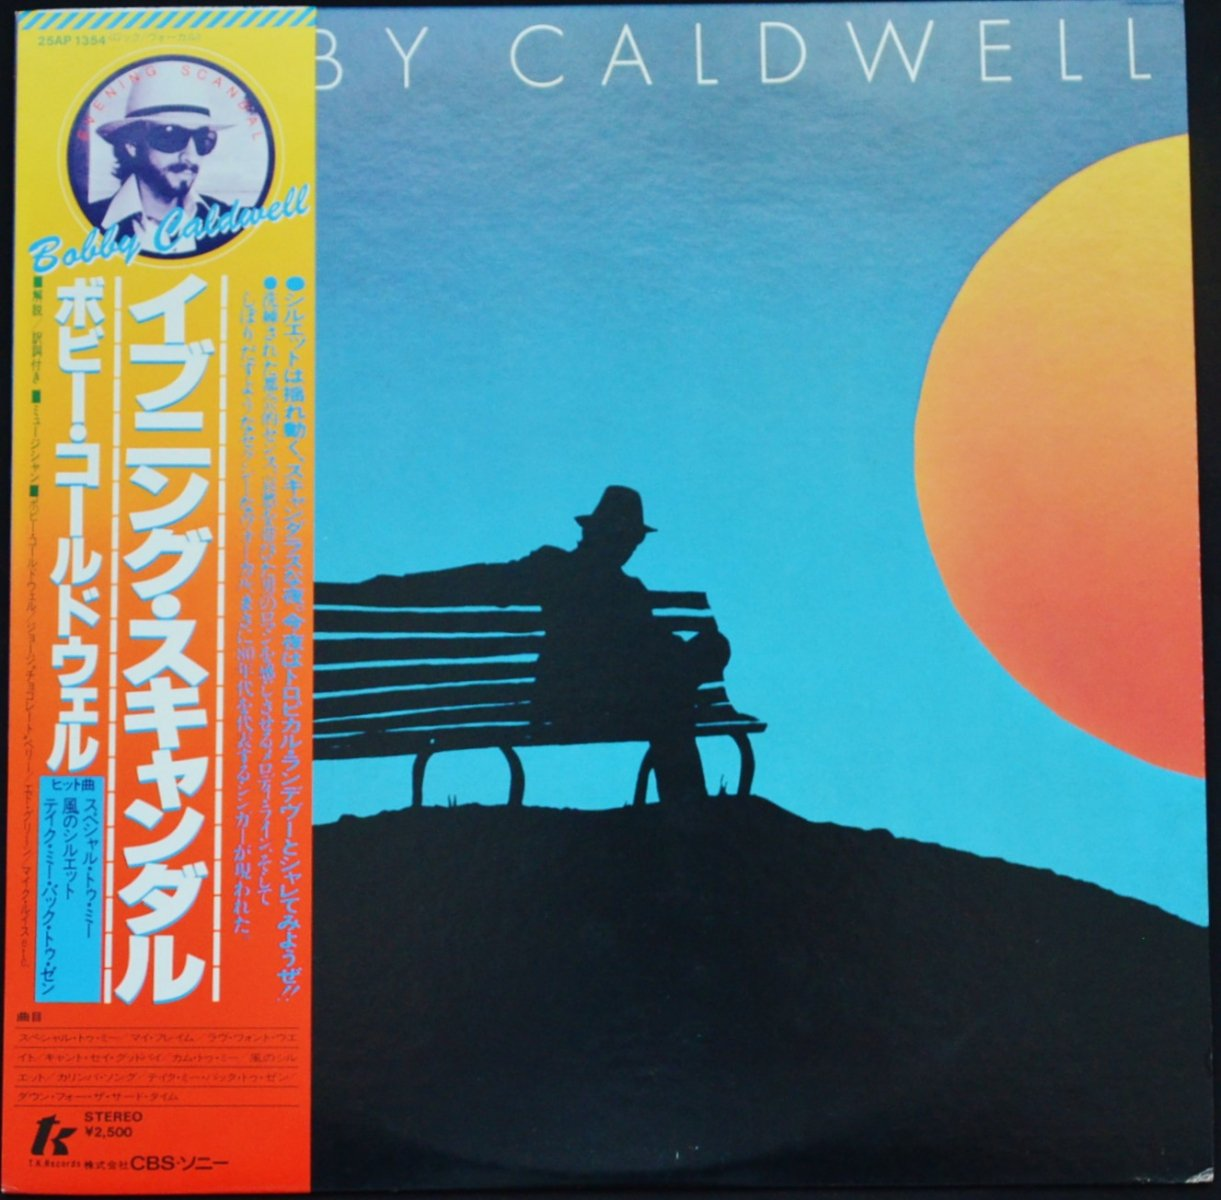 BOBBY CALDWELL / EVENING SCANDAL (LP)